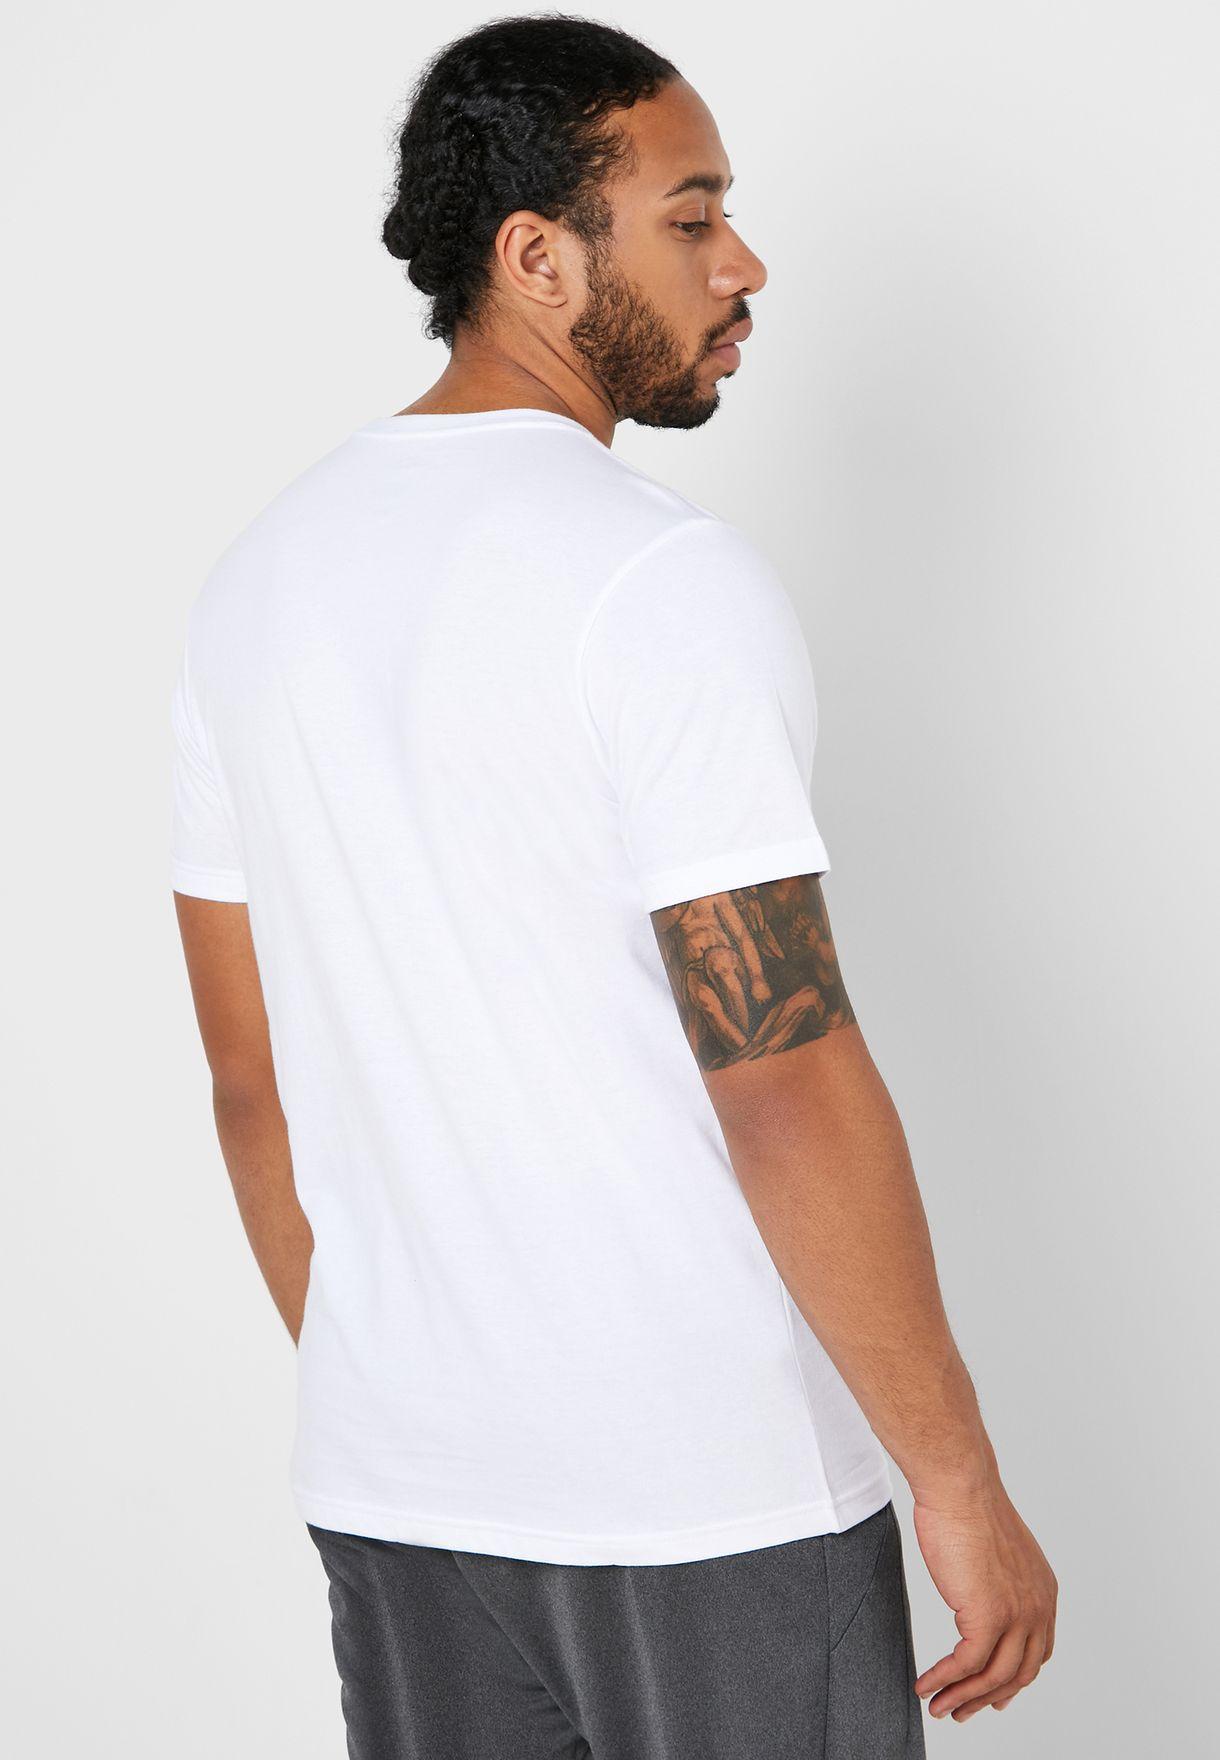 DNA Spiral Graphic T-Shirt